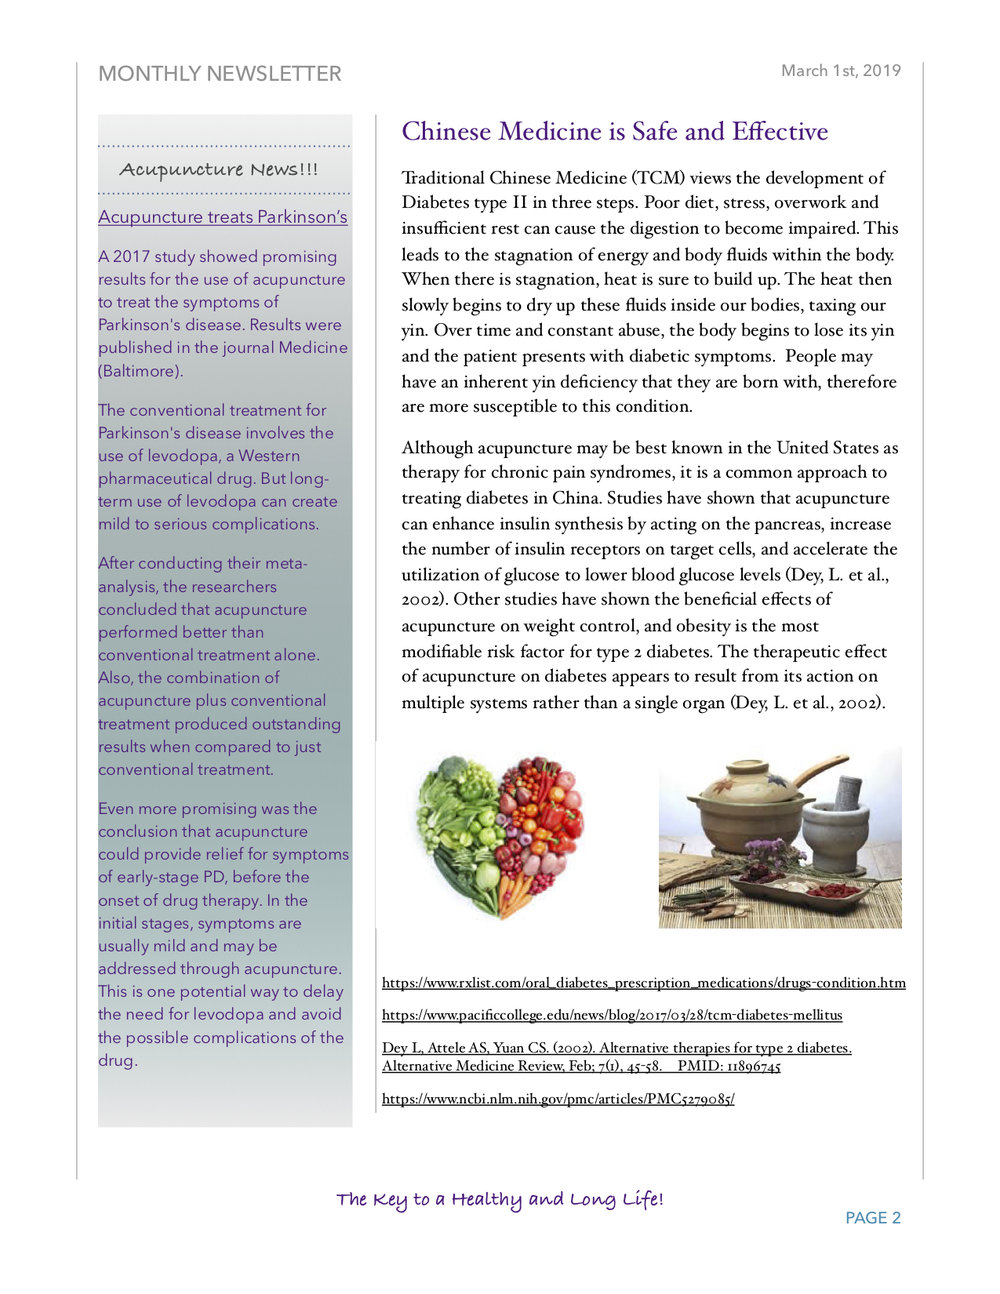 Monthly Newsletter March 2019 JPG 2.jpg